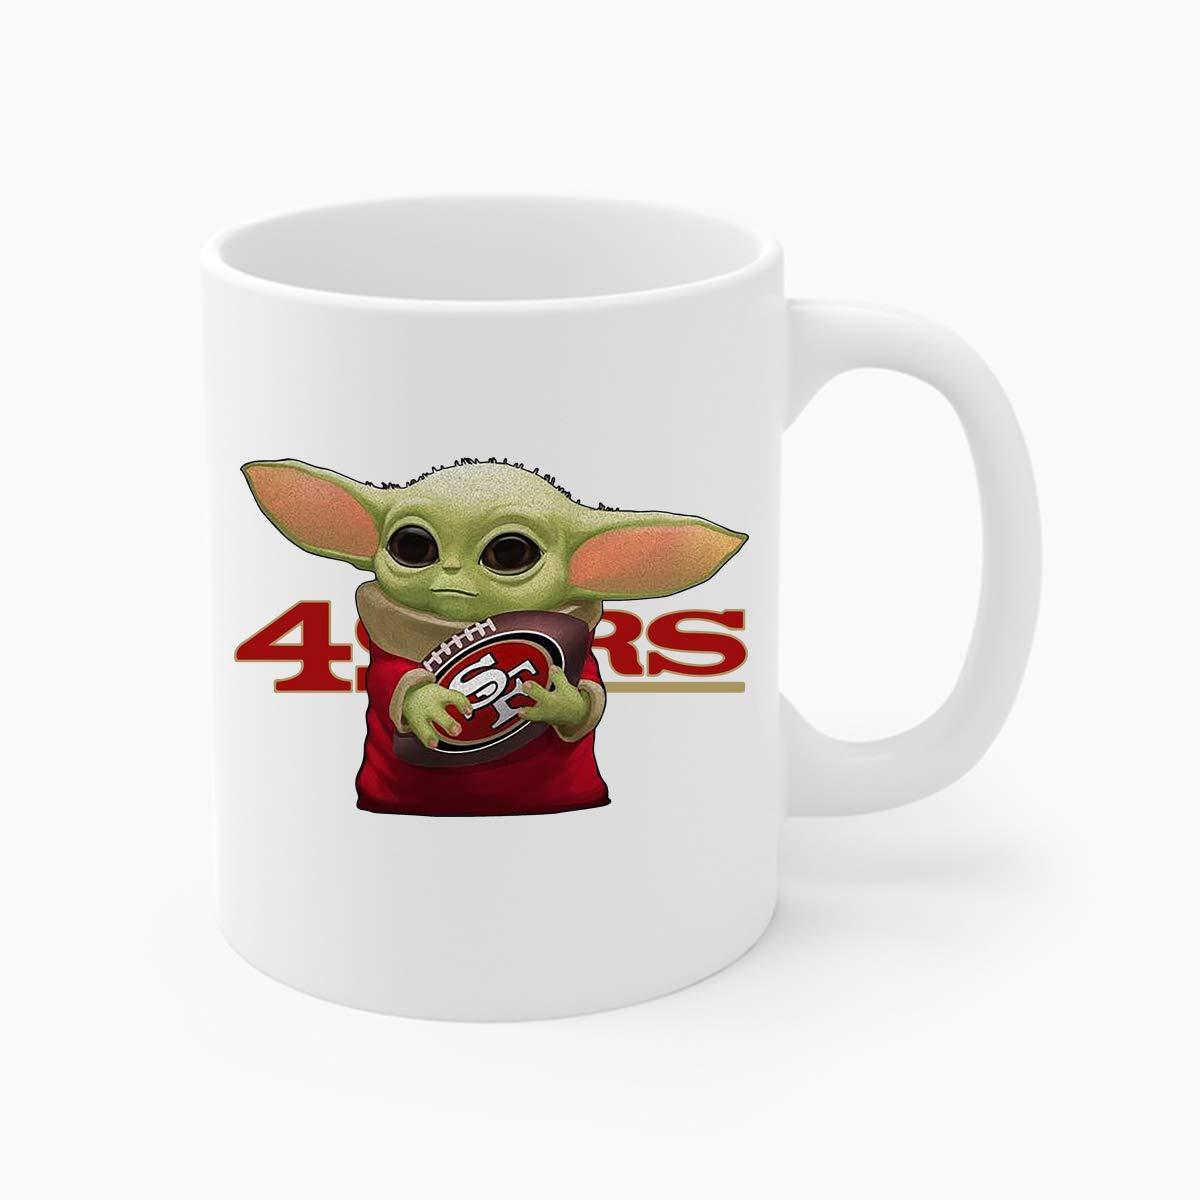 coffee mug latte mug water bottle Baby Yodan H u g S a n Fran cis co mug travel mug tumbler